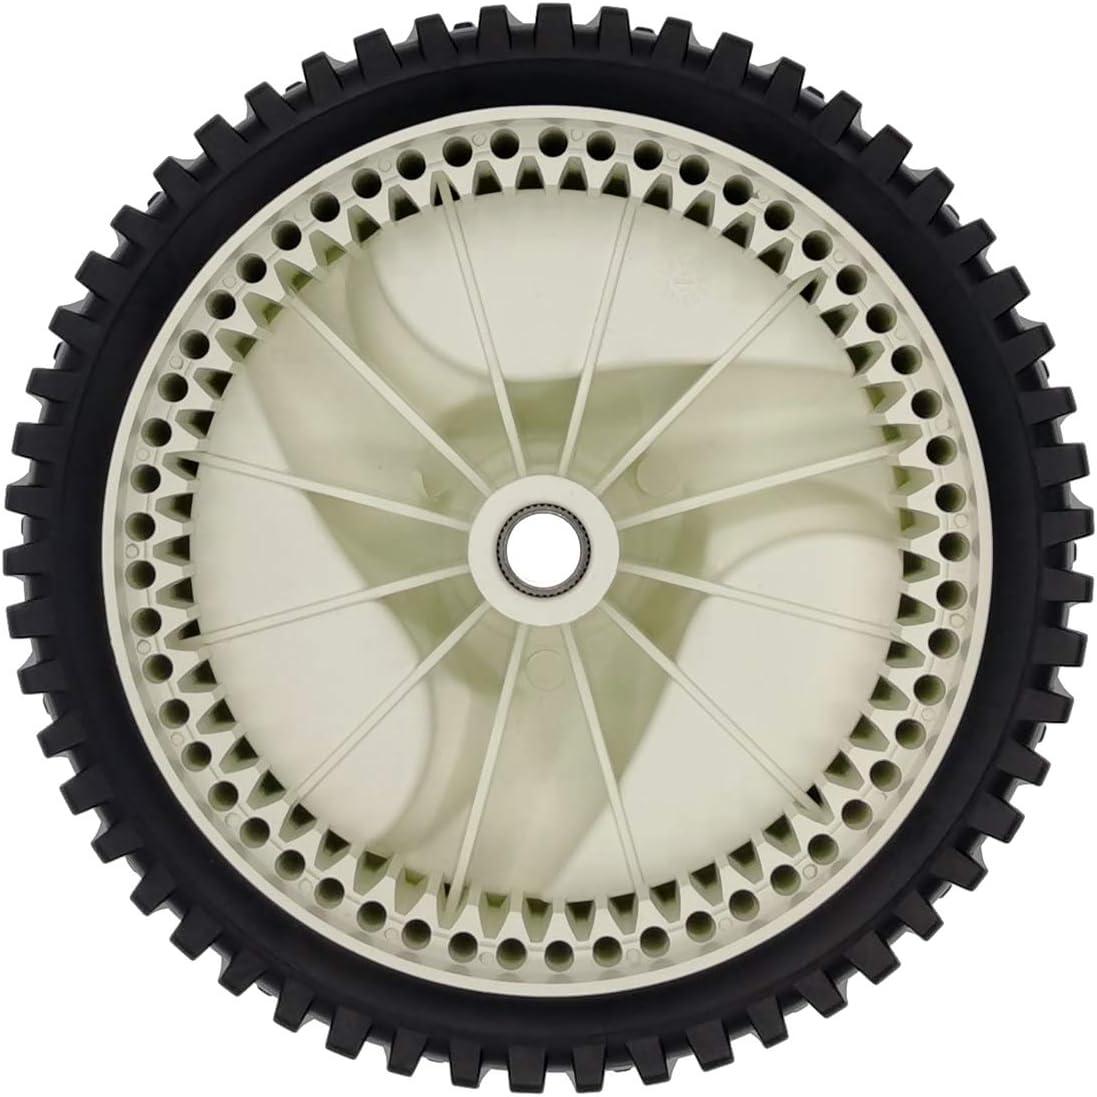 Motorrad-Antriebsrad f/ür Husqvarna Craftsman AYP 194231X427 532403111 700953 583104401